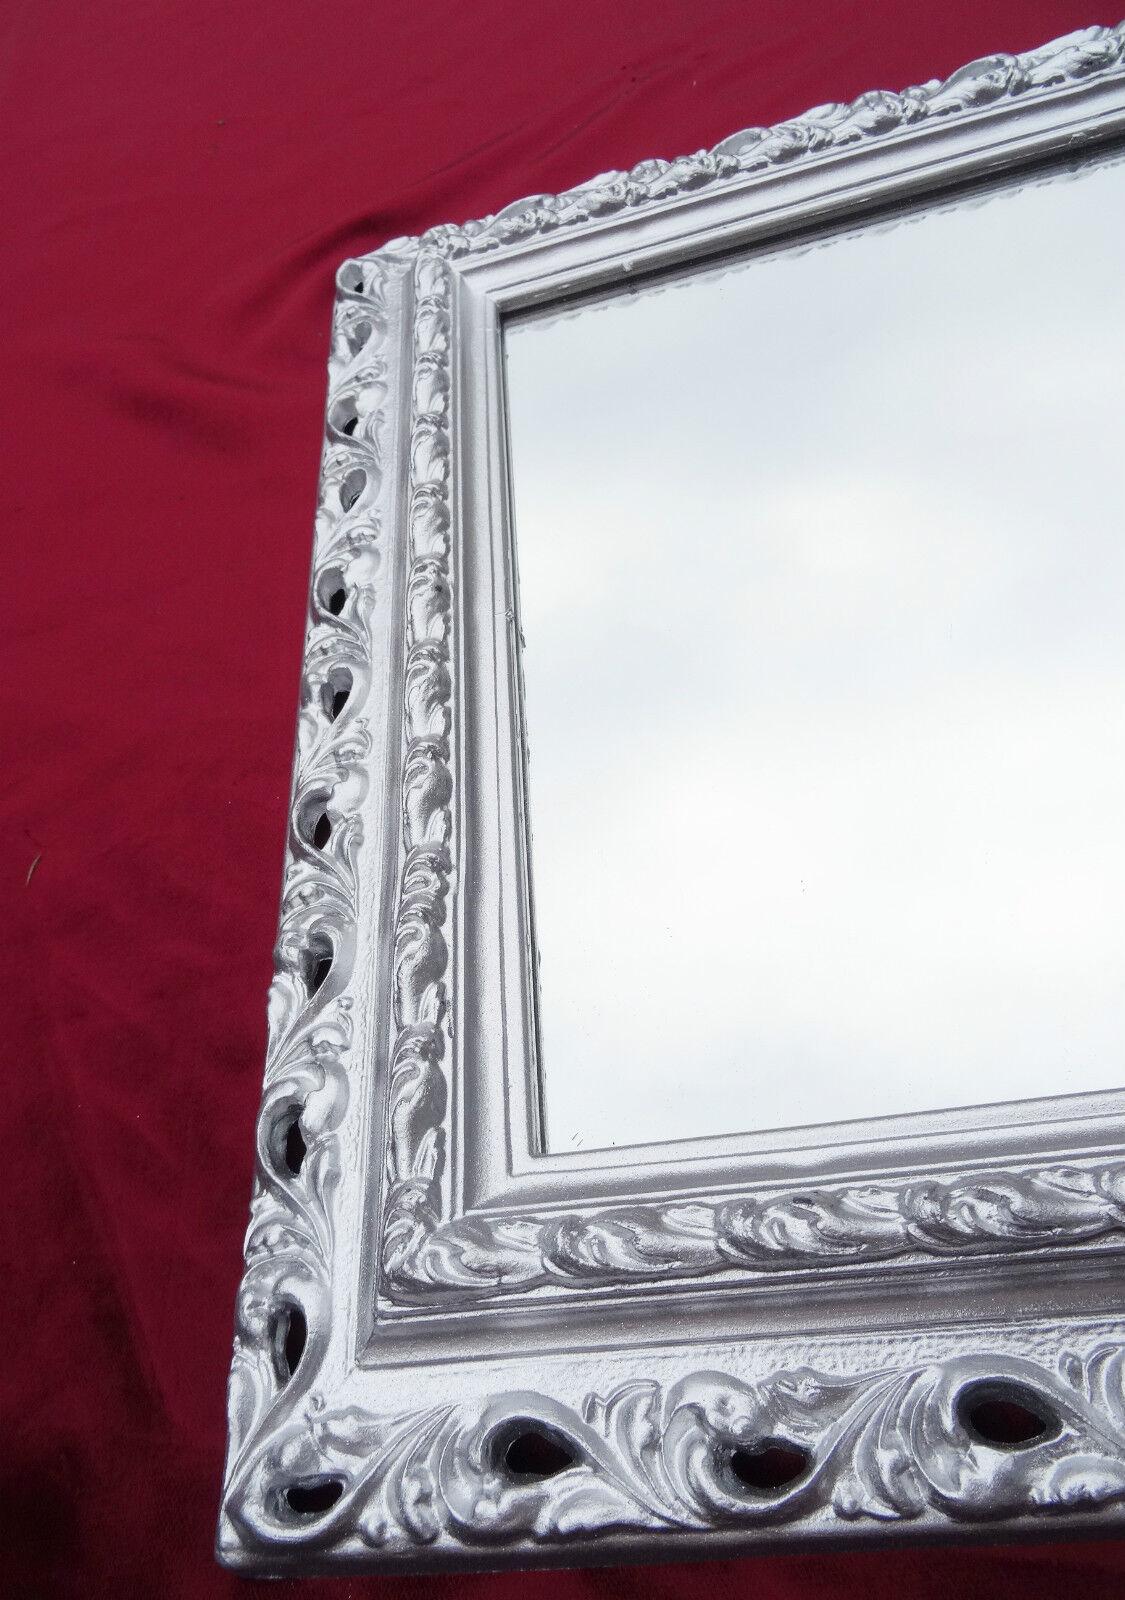 wandspiegel 43x36 spiegel barock rechteckig repro silber bilderrahmen arabesco 3 ebay. Black Bedroom Furniture Sets. Home Design Ideas